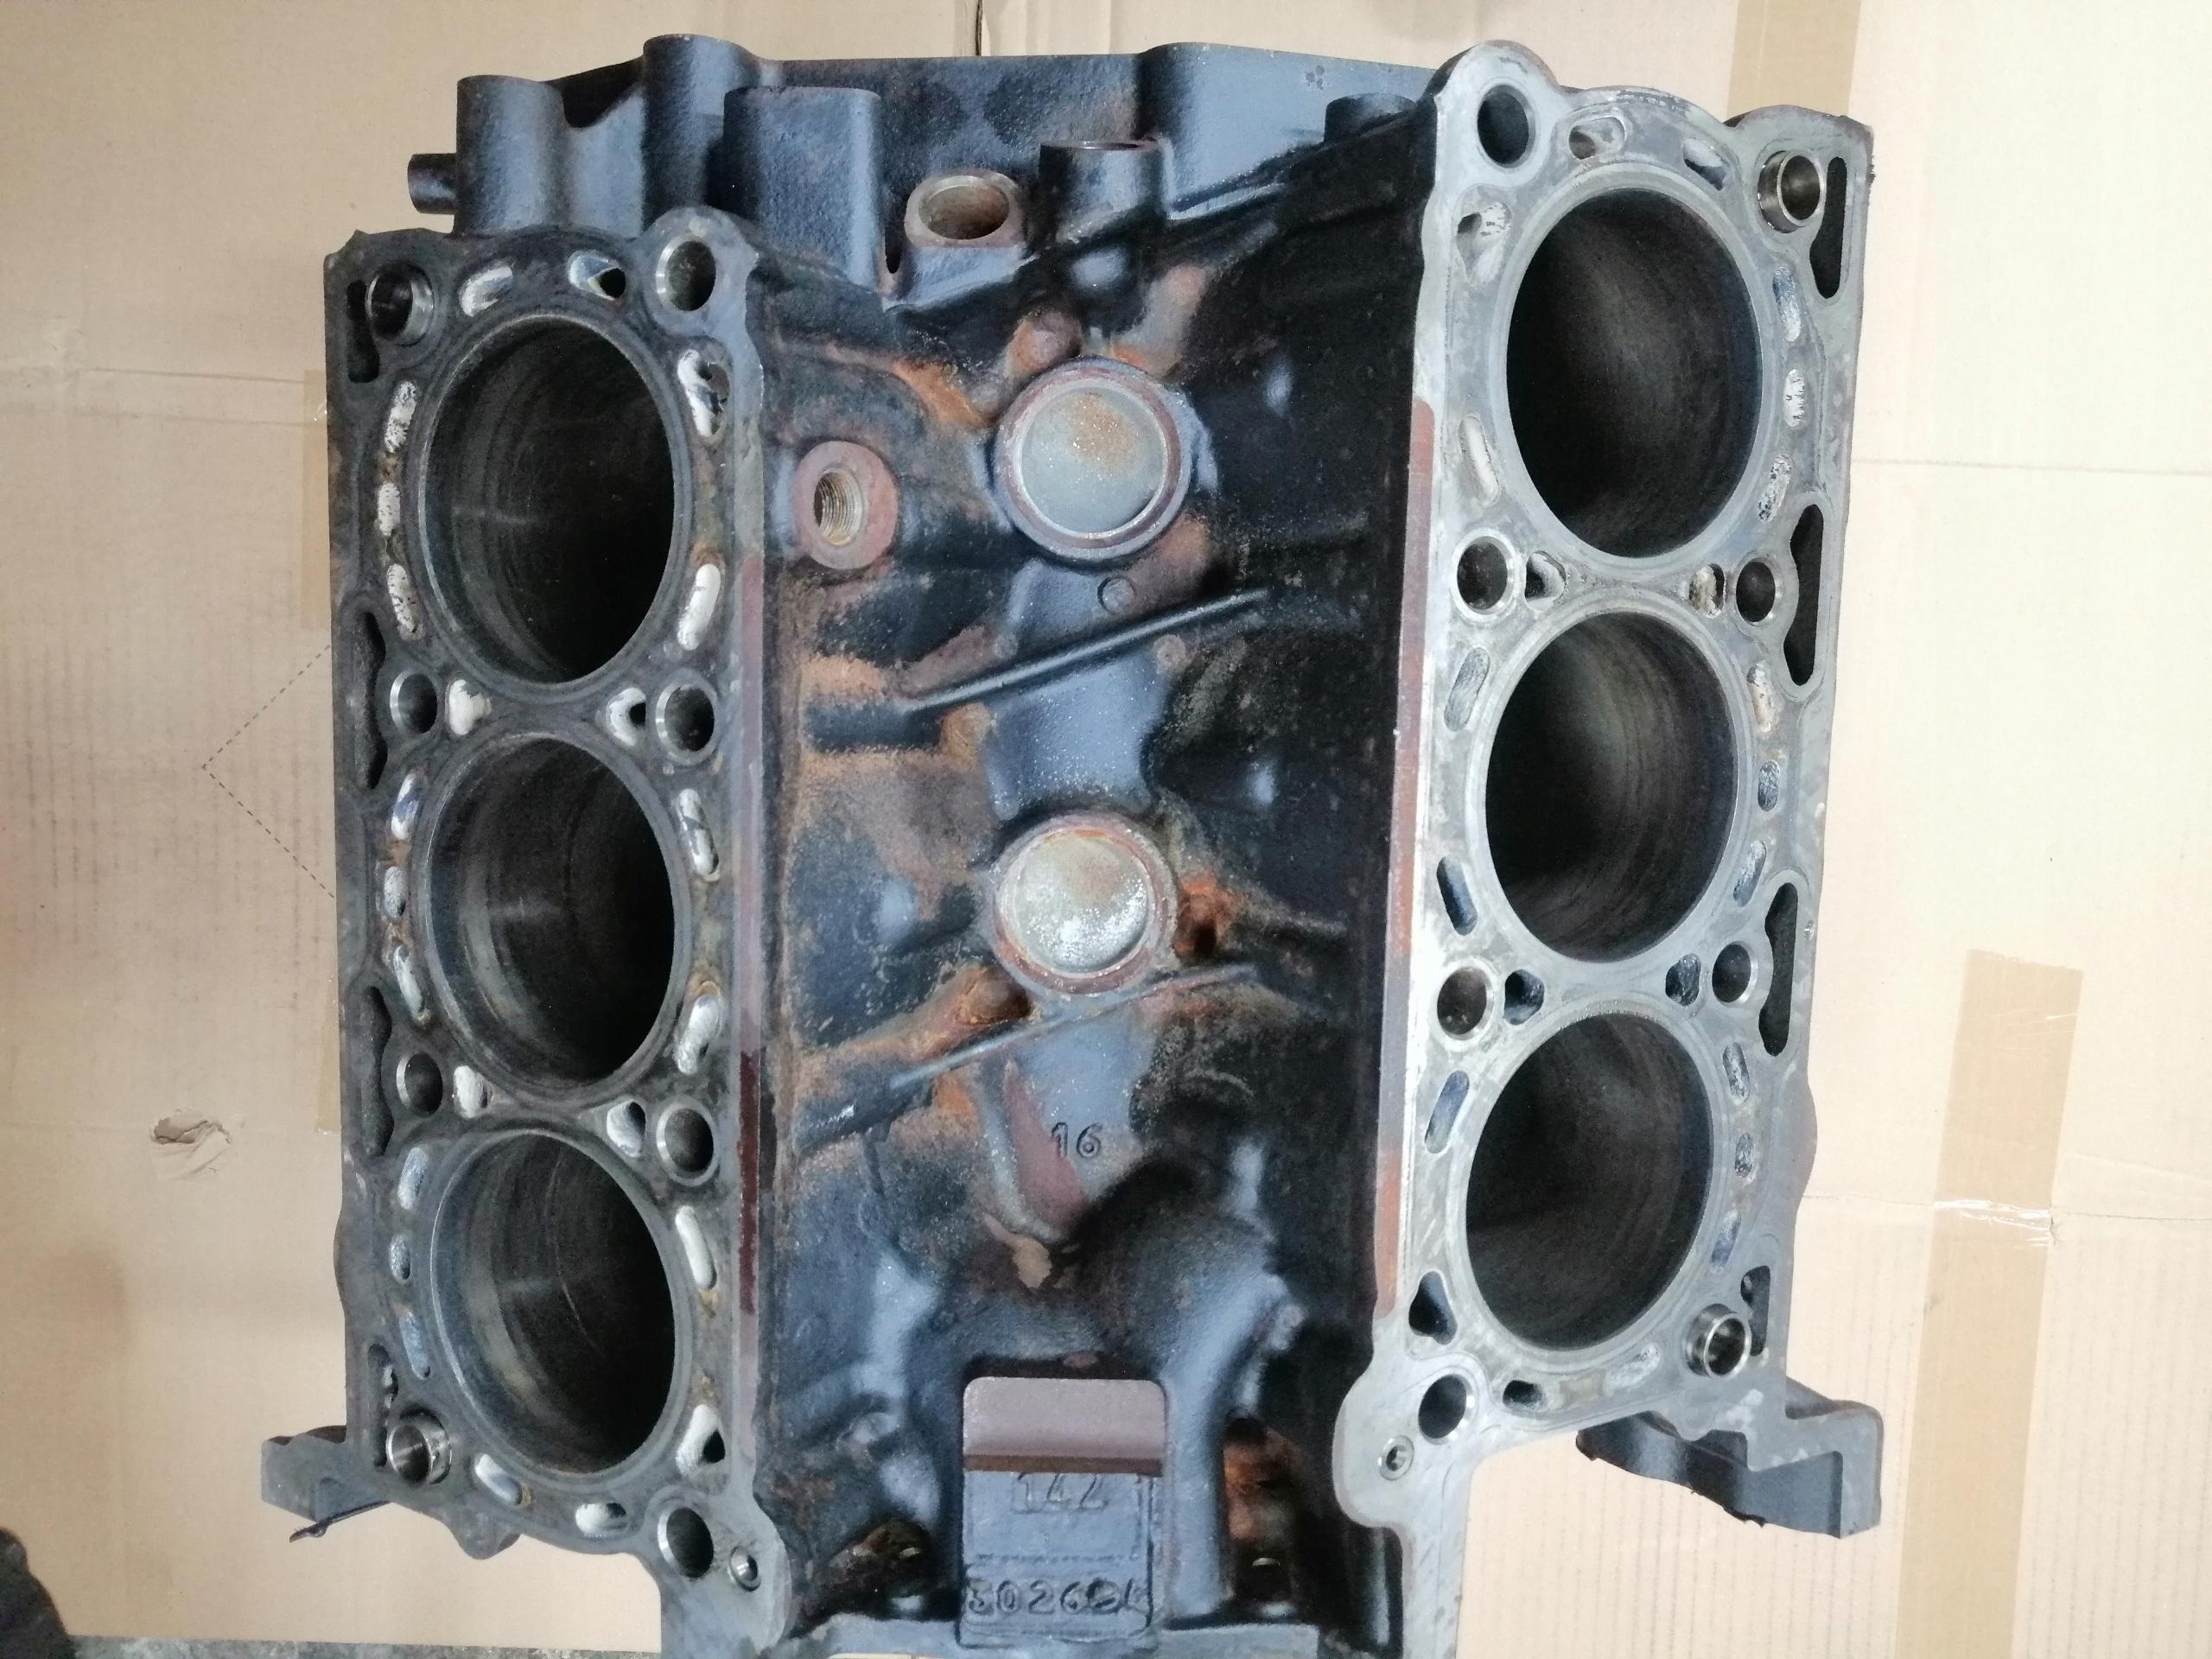 джип grand cherokee wk2 блок двигателя 30crd vm63d